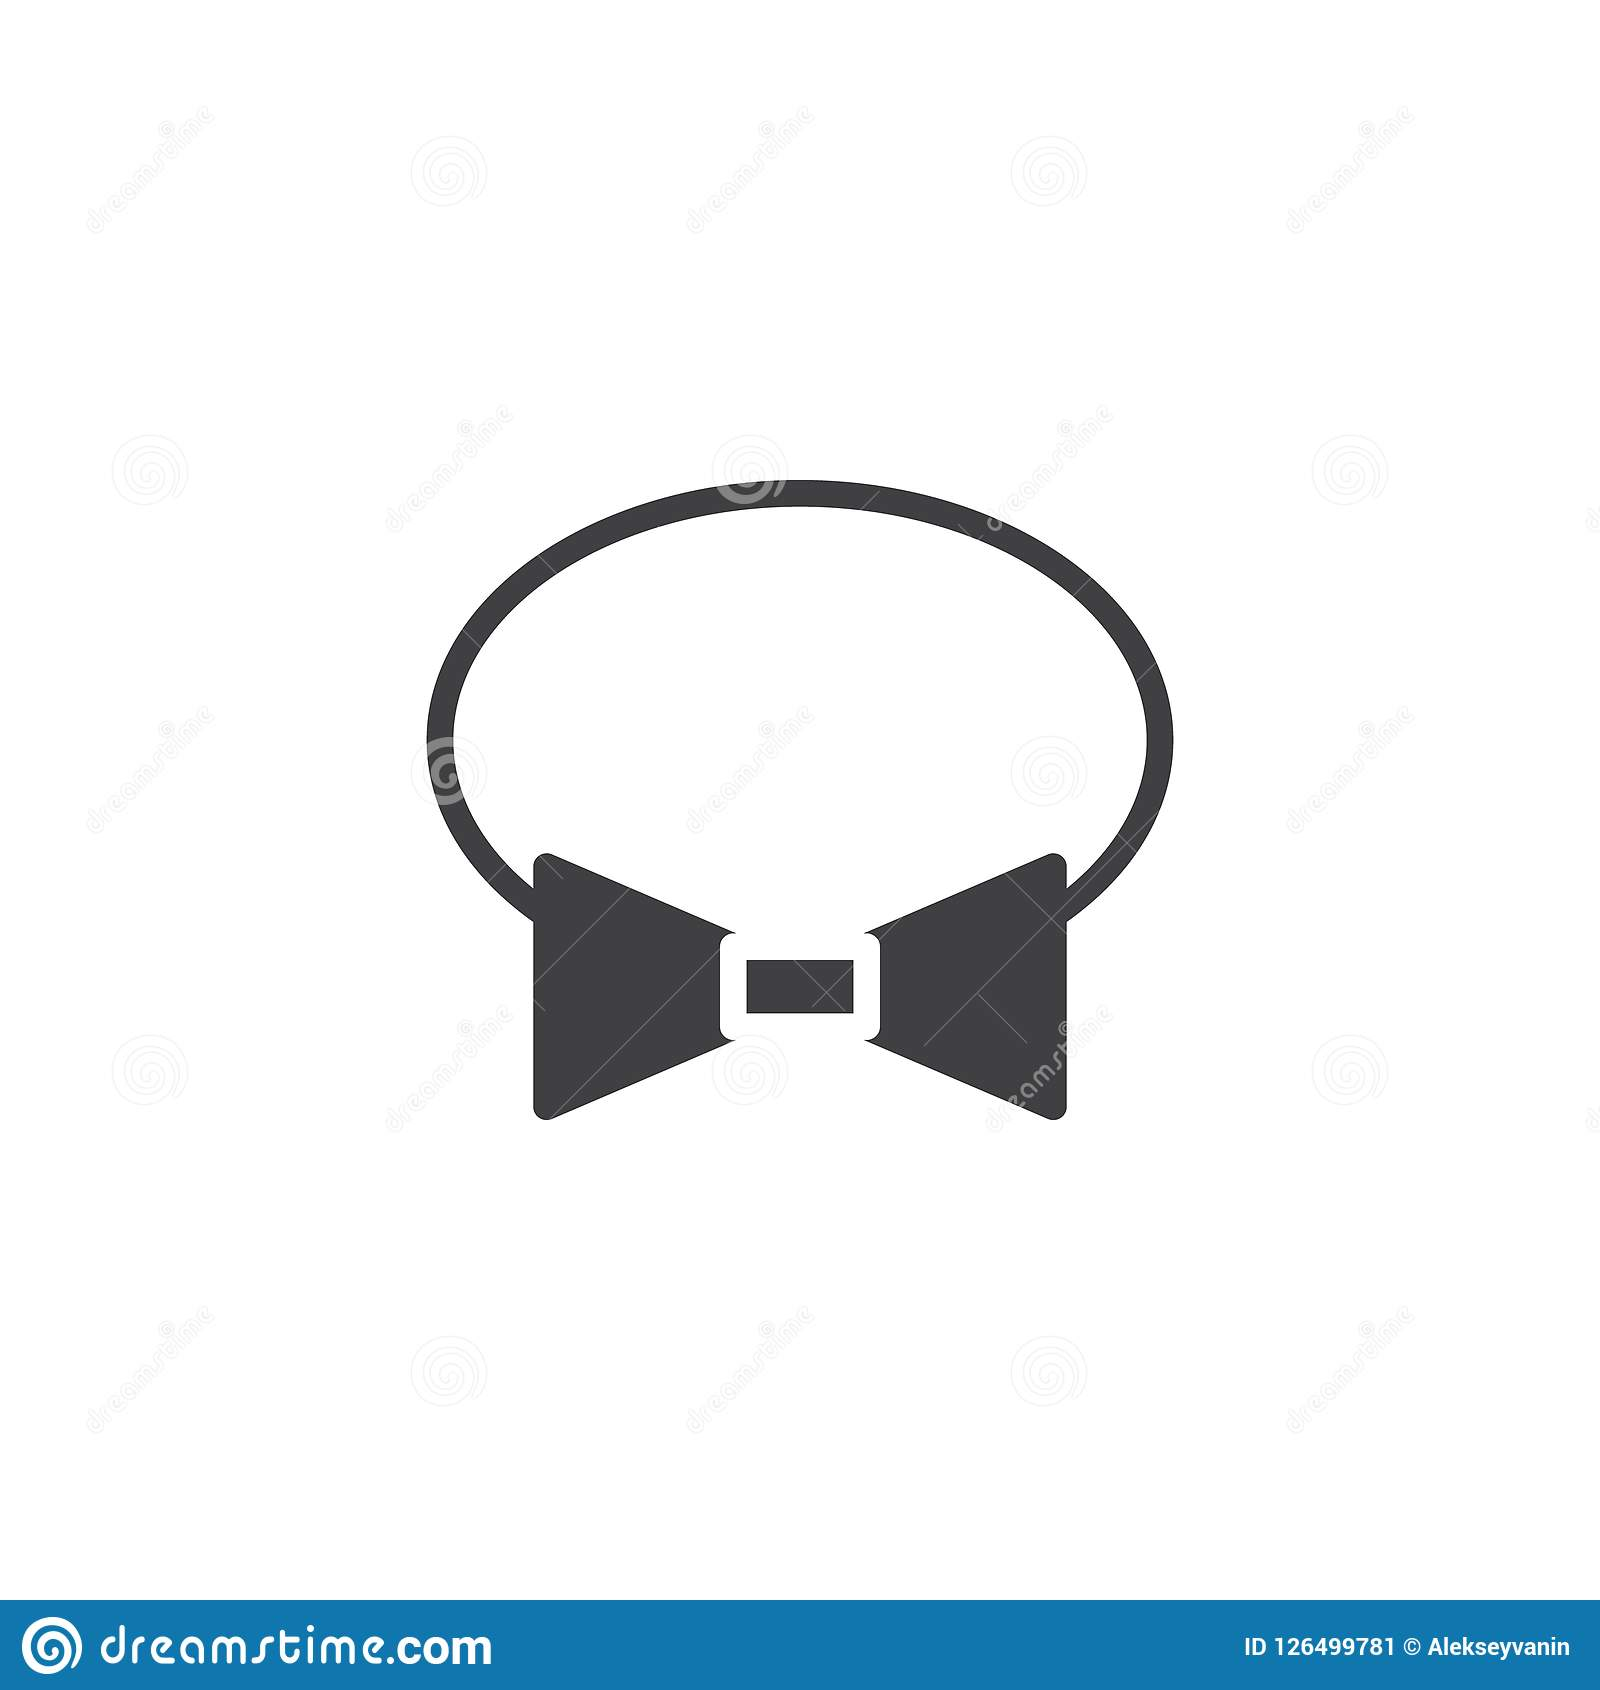 Bow Tie Vector Icon Stock Vector Illustration Of Symbol 126499781